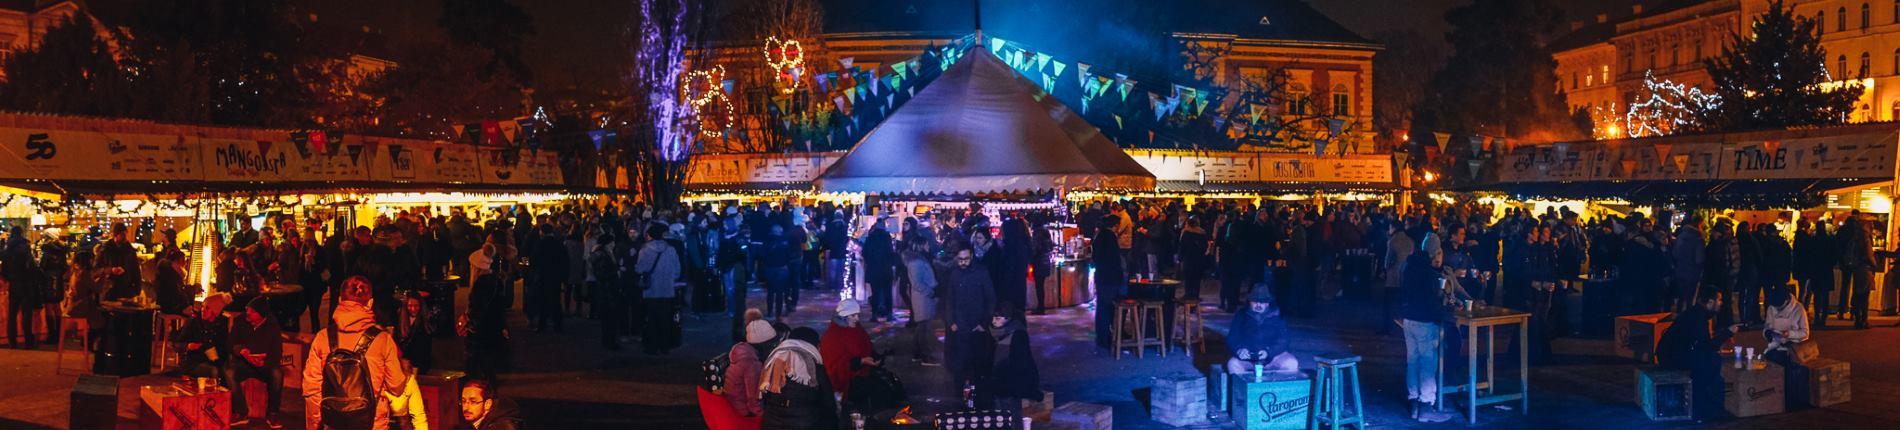 FOTO: Fuliranje na Strossmayerovom trgu otvara svoja vrata